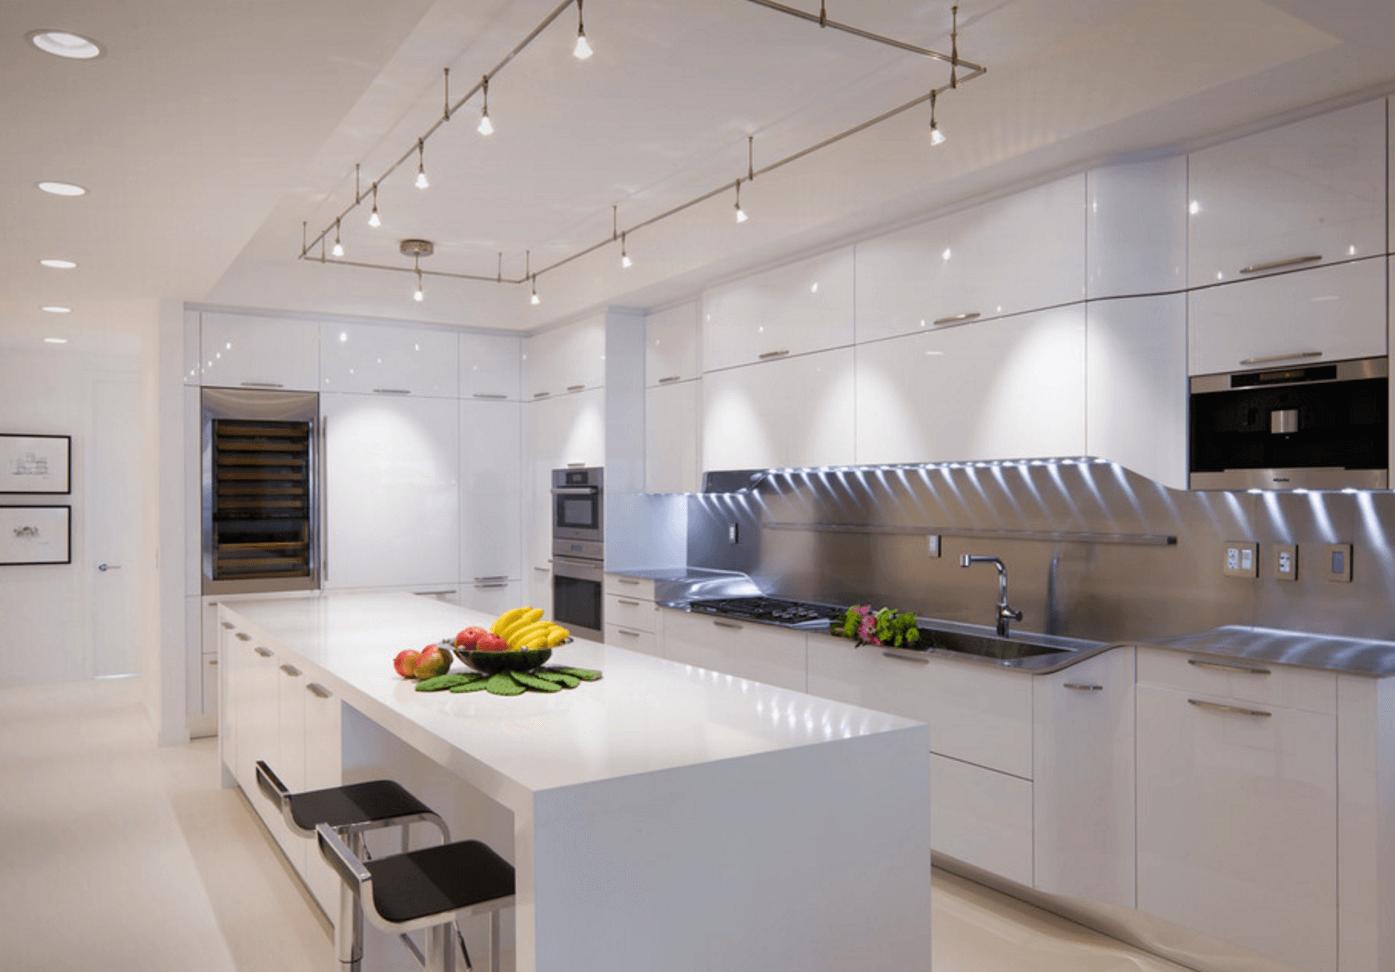 15 Easy Kitchen Lighting Upgrades